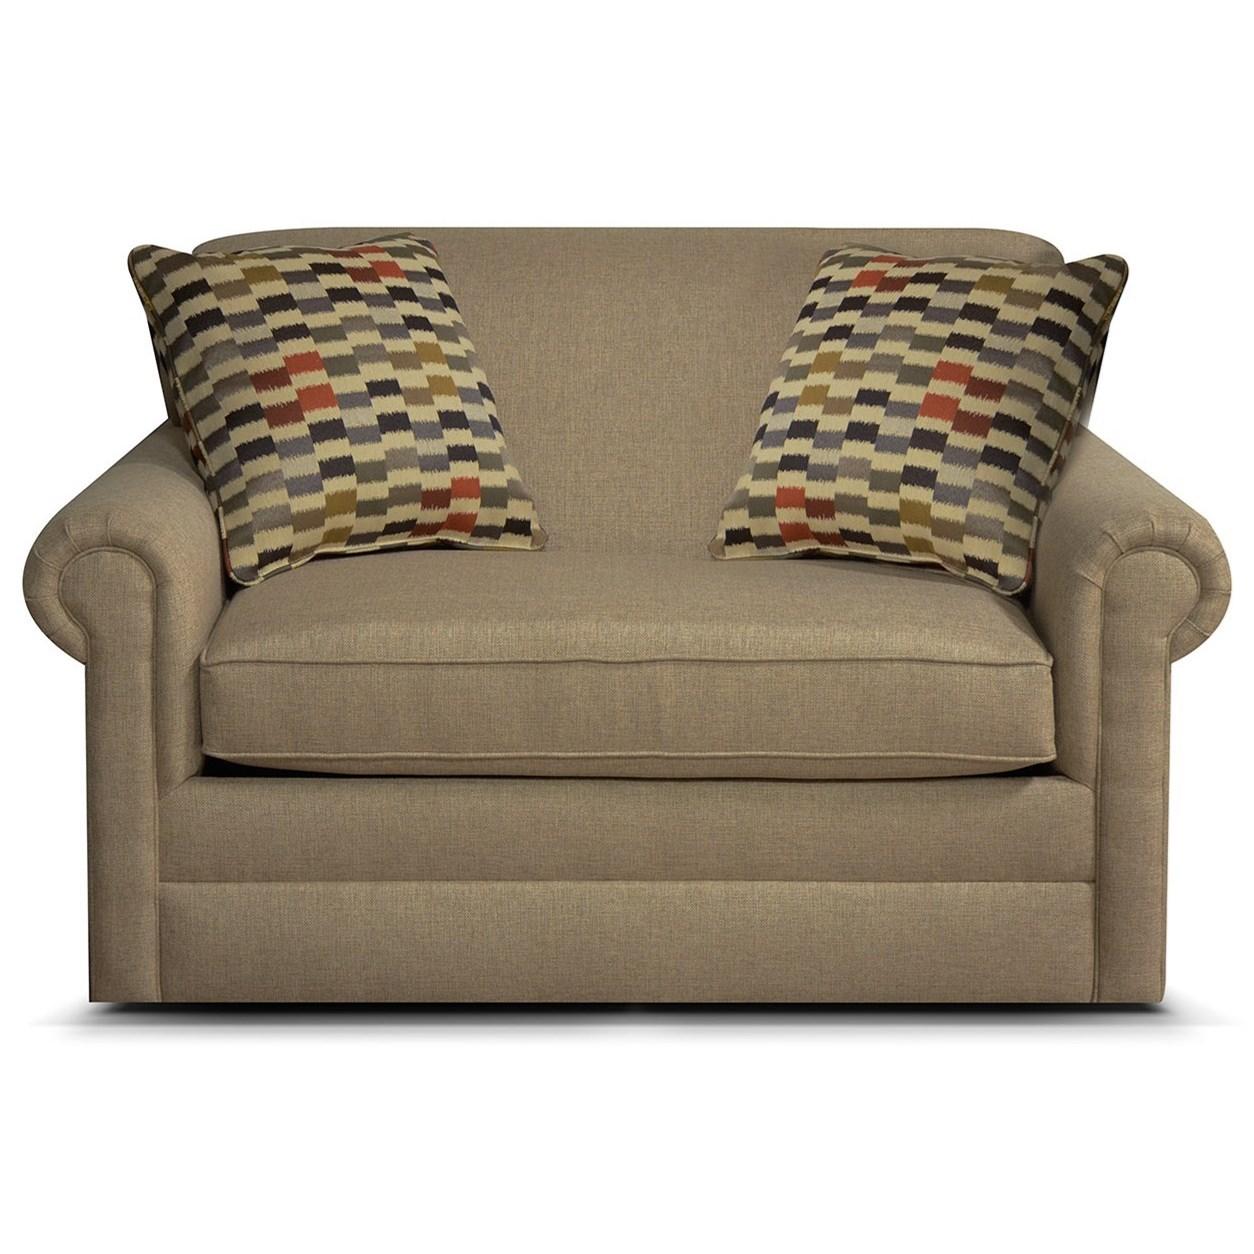 England Savona Air Twin Size Sleeper Sofa With Traditional